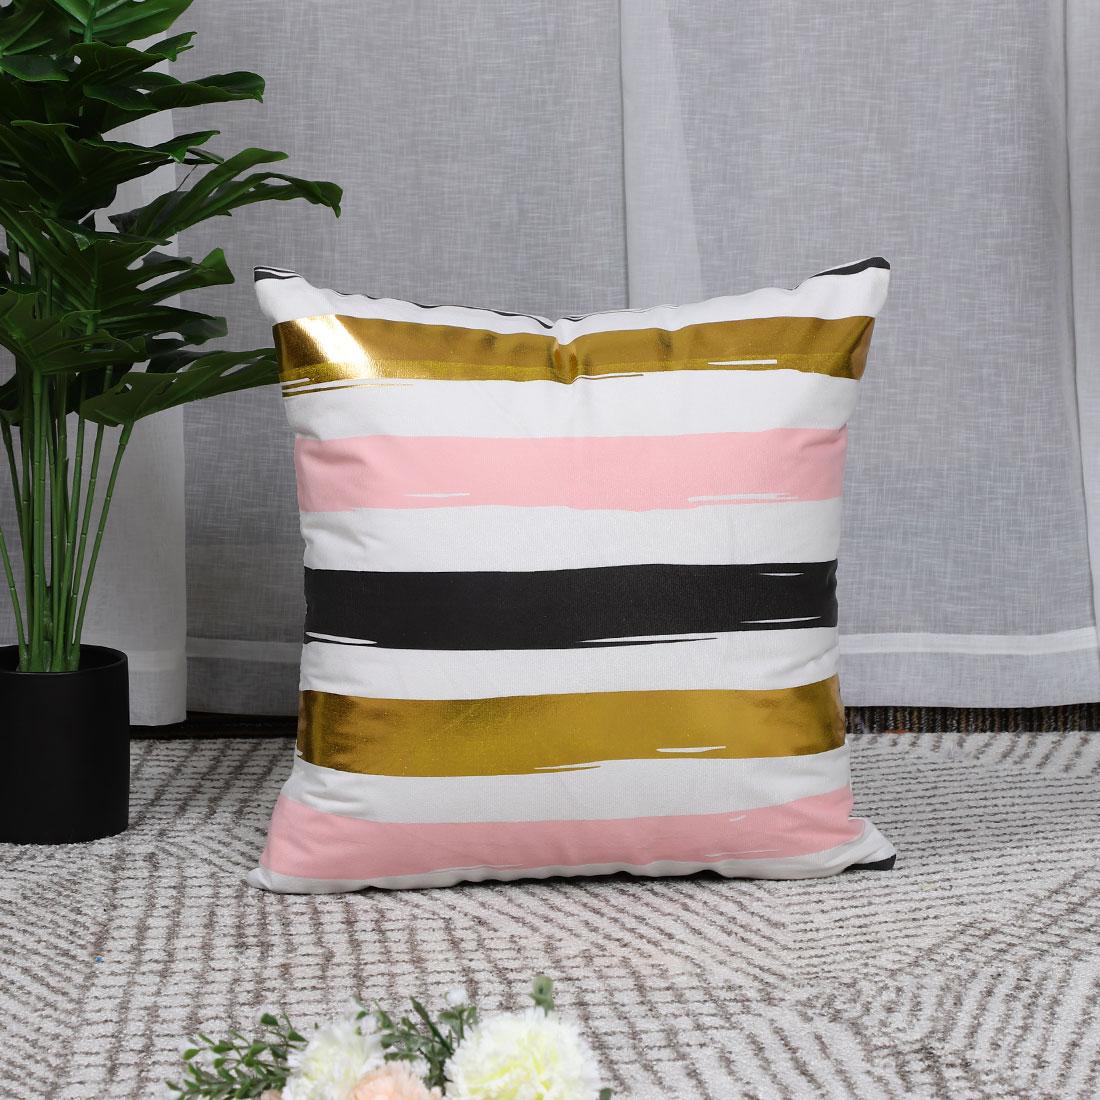 Decoration-Pillow-Covers-Cotton-Linen-Throw-Pillow-Case-Cushion-Cover thumbnail 34